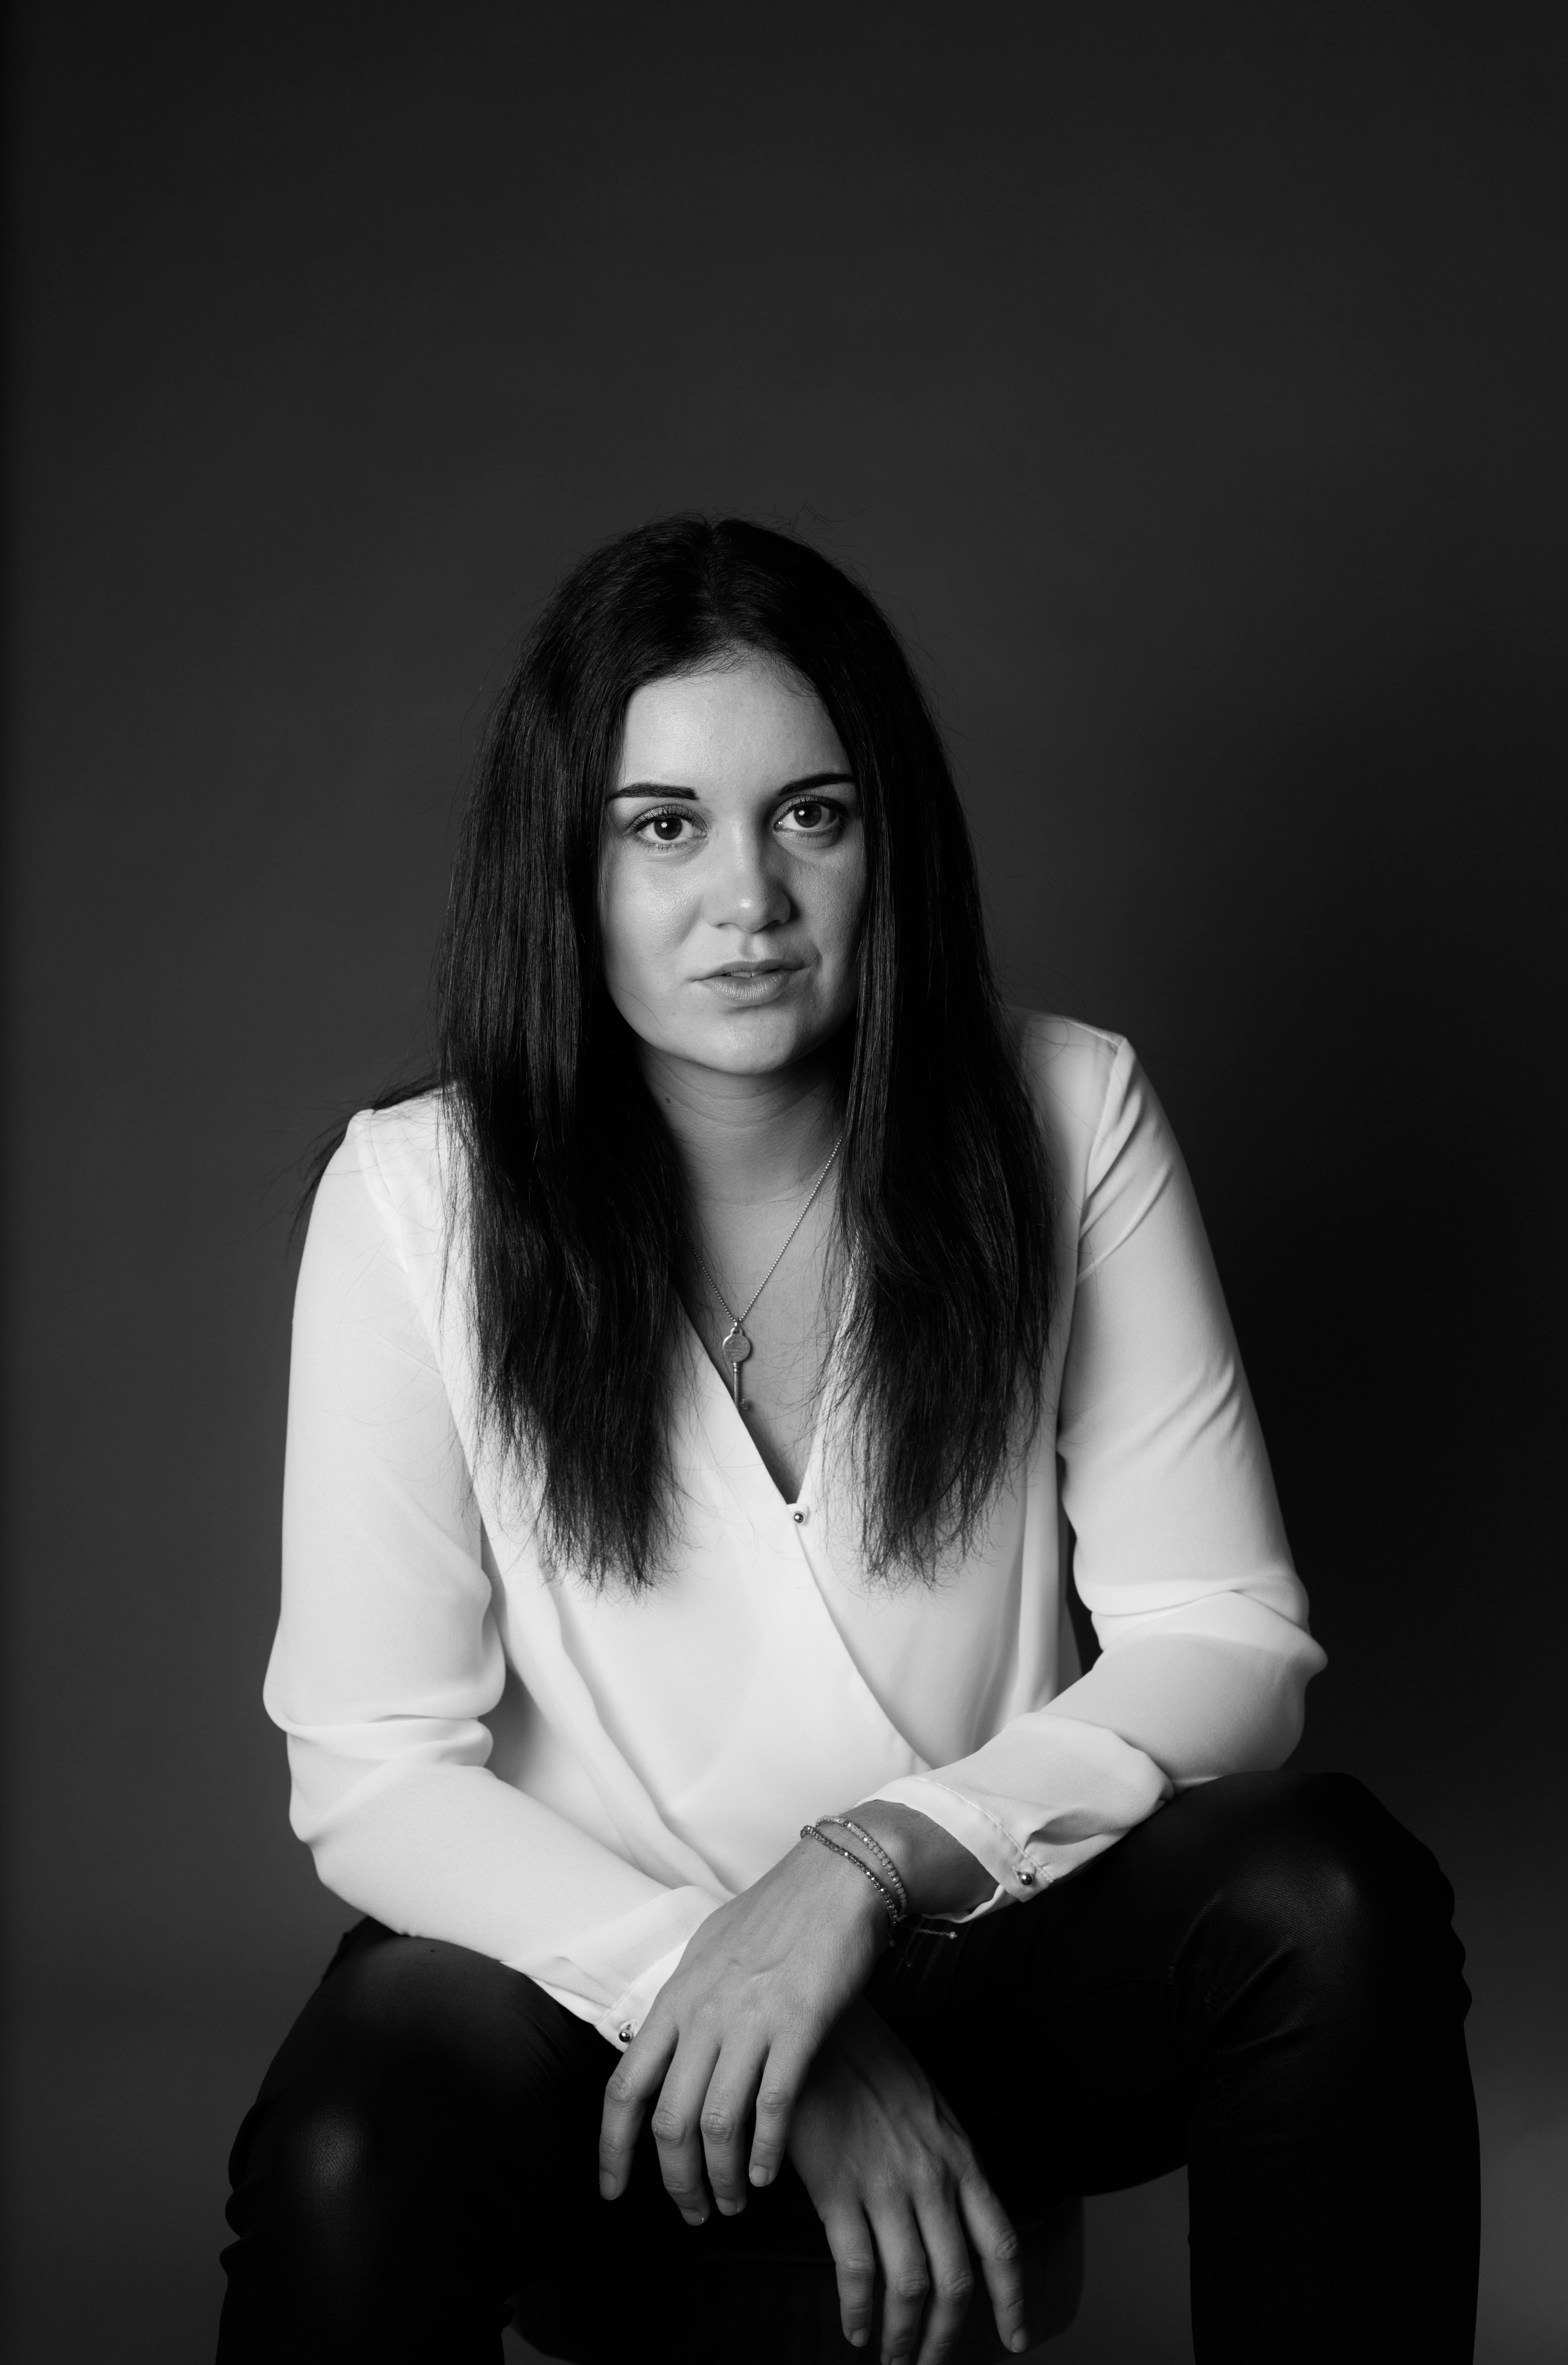 Portraitfotografie Studio